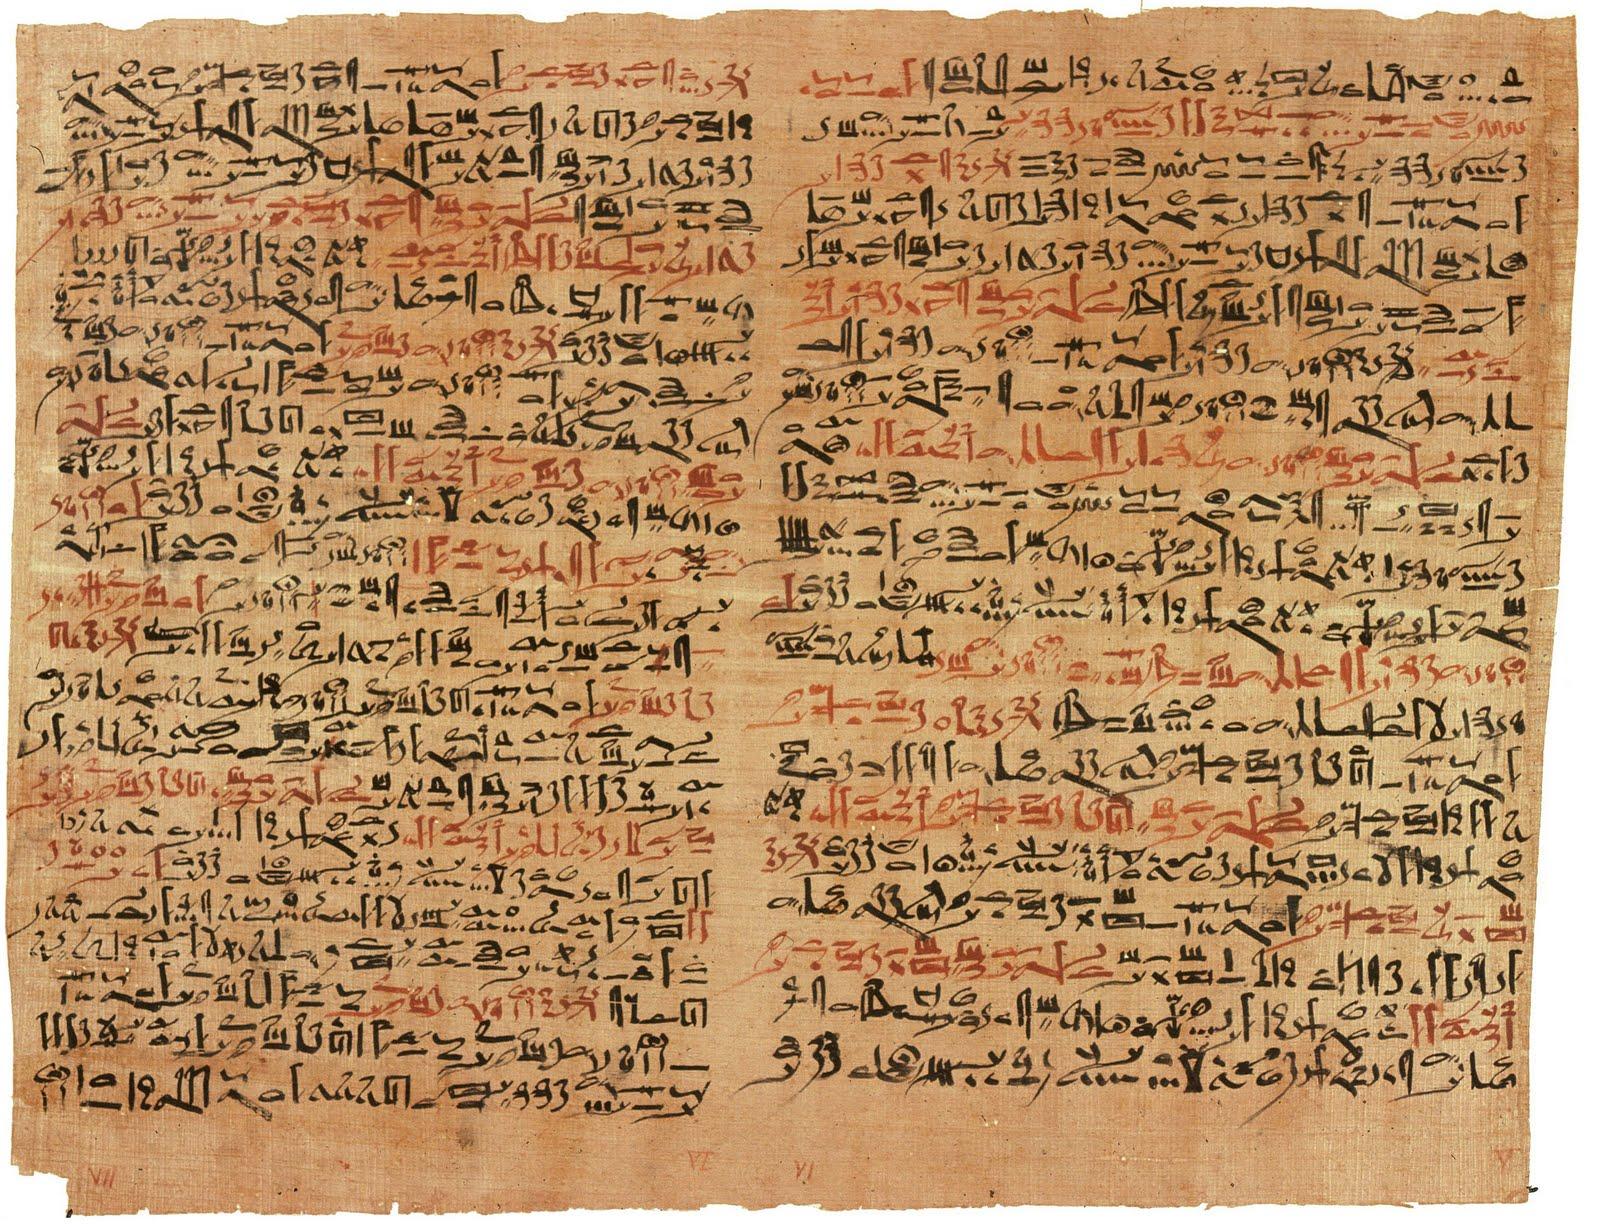 Kemetic History of Afrika * Blue Lotus*: ANCIENT HIERATIC